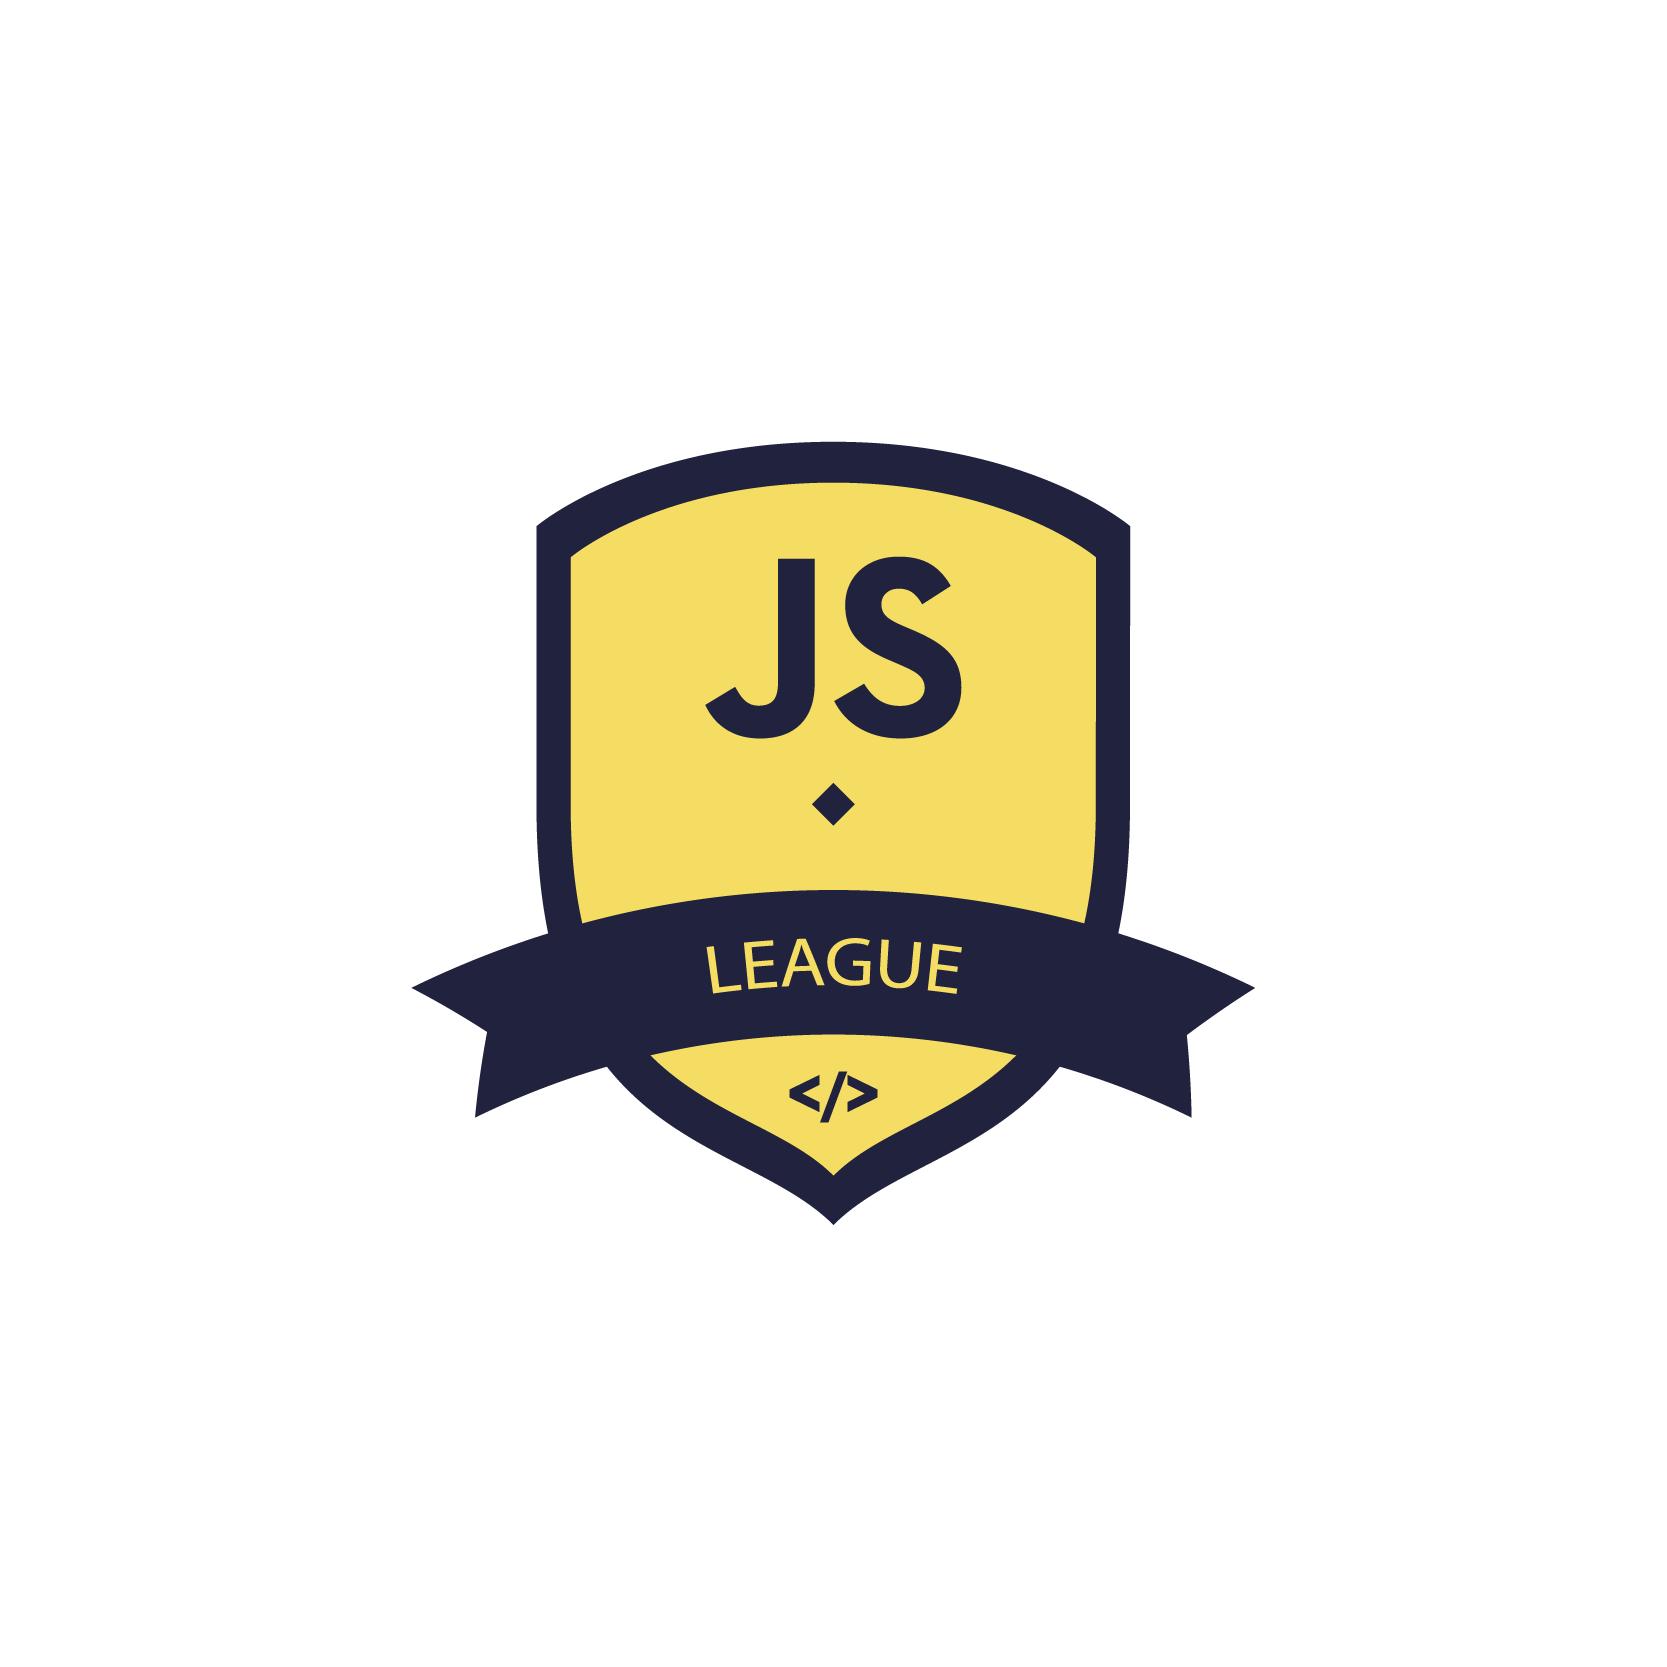 JSLeague logo